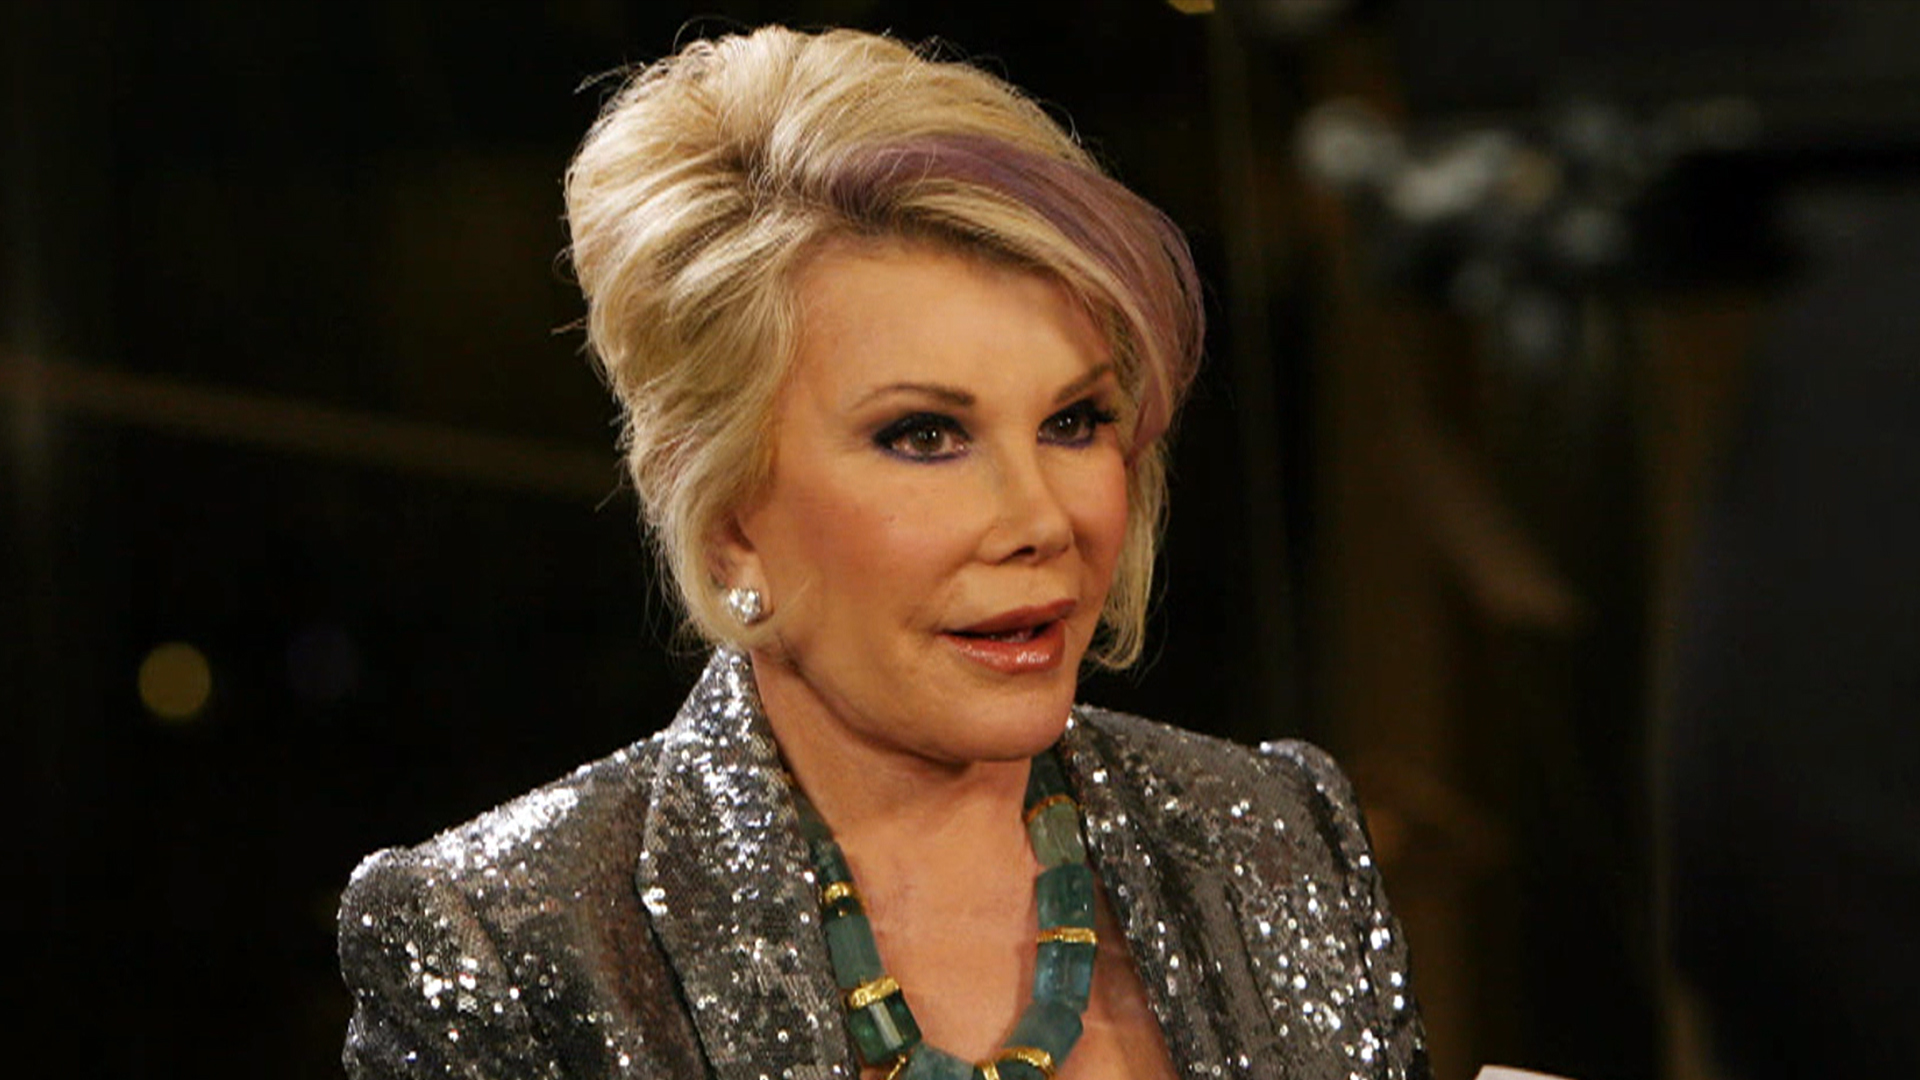 Joan Rivers Hair Styles The Hidden Agenda Of Joan Rivers Hairstyle  Joan Rivers Hairstyle .